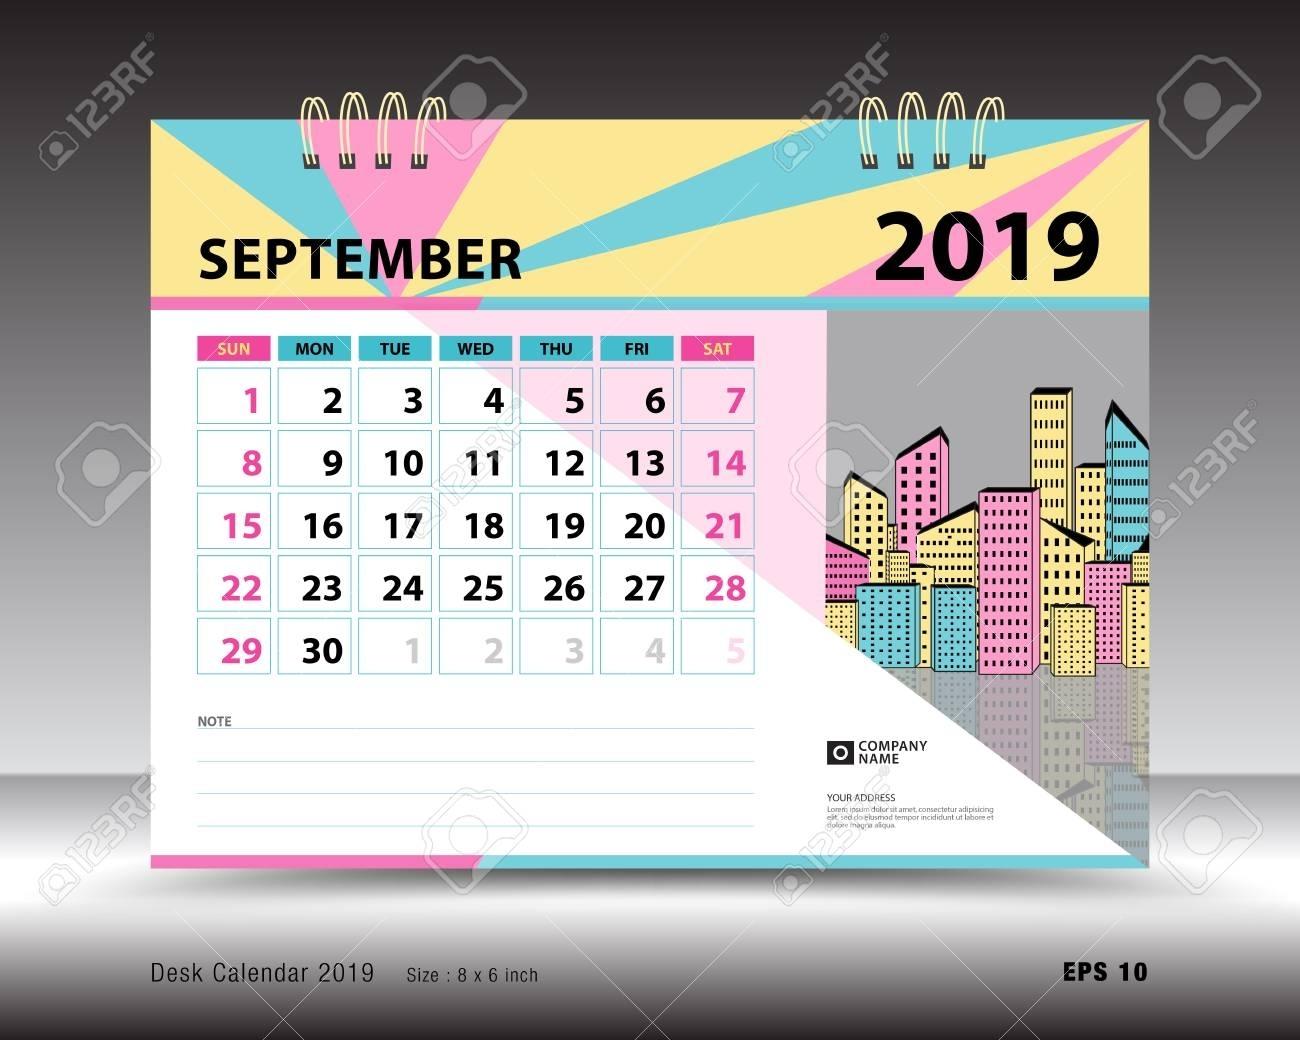 Desk Calendar For September 2019 Template, Printable Calendar,..